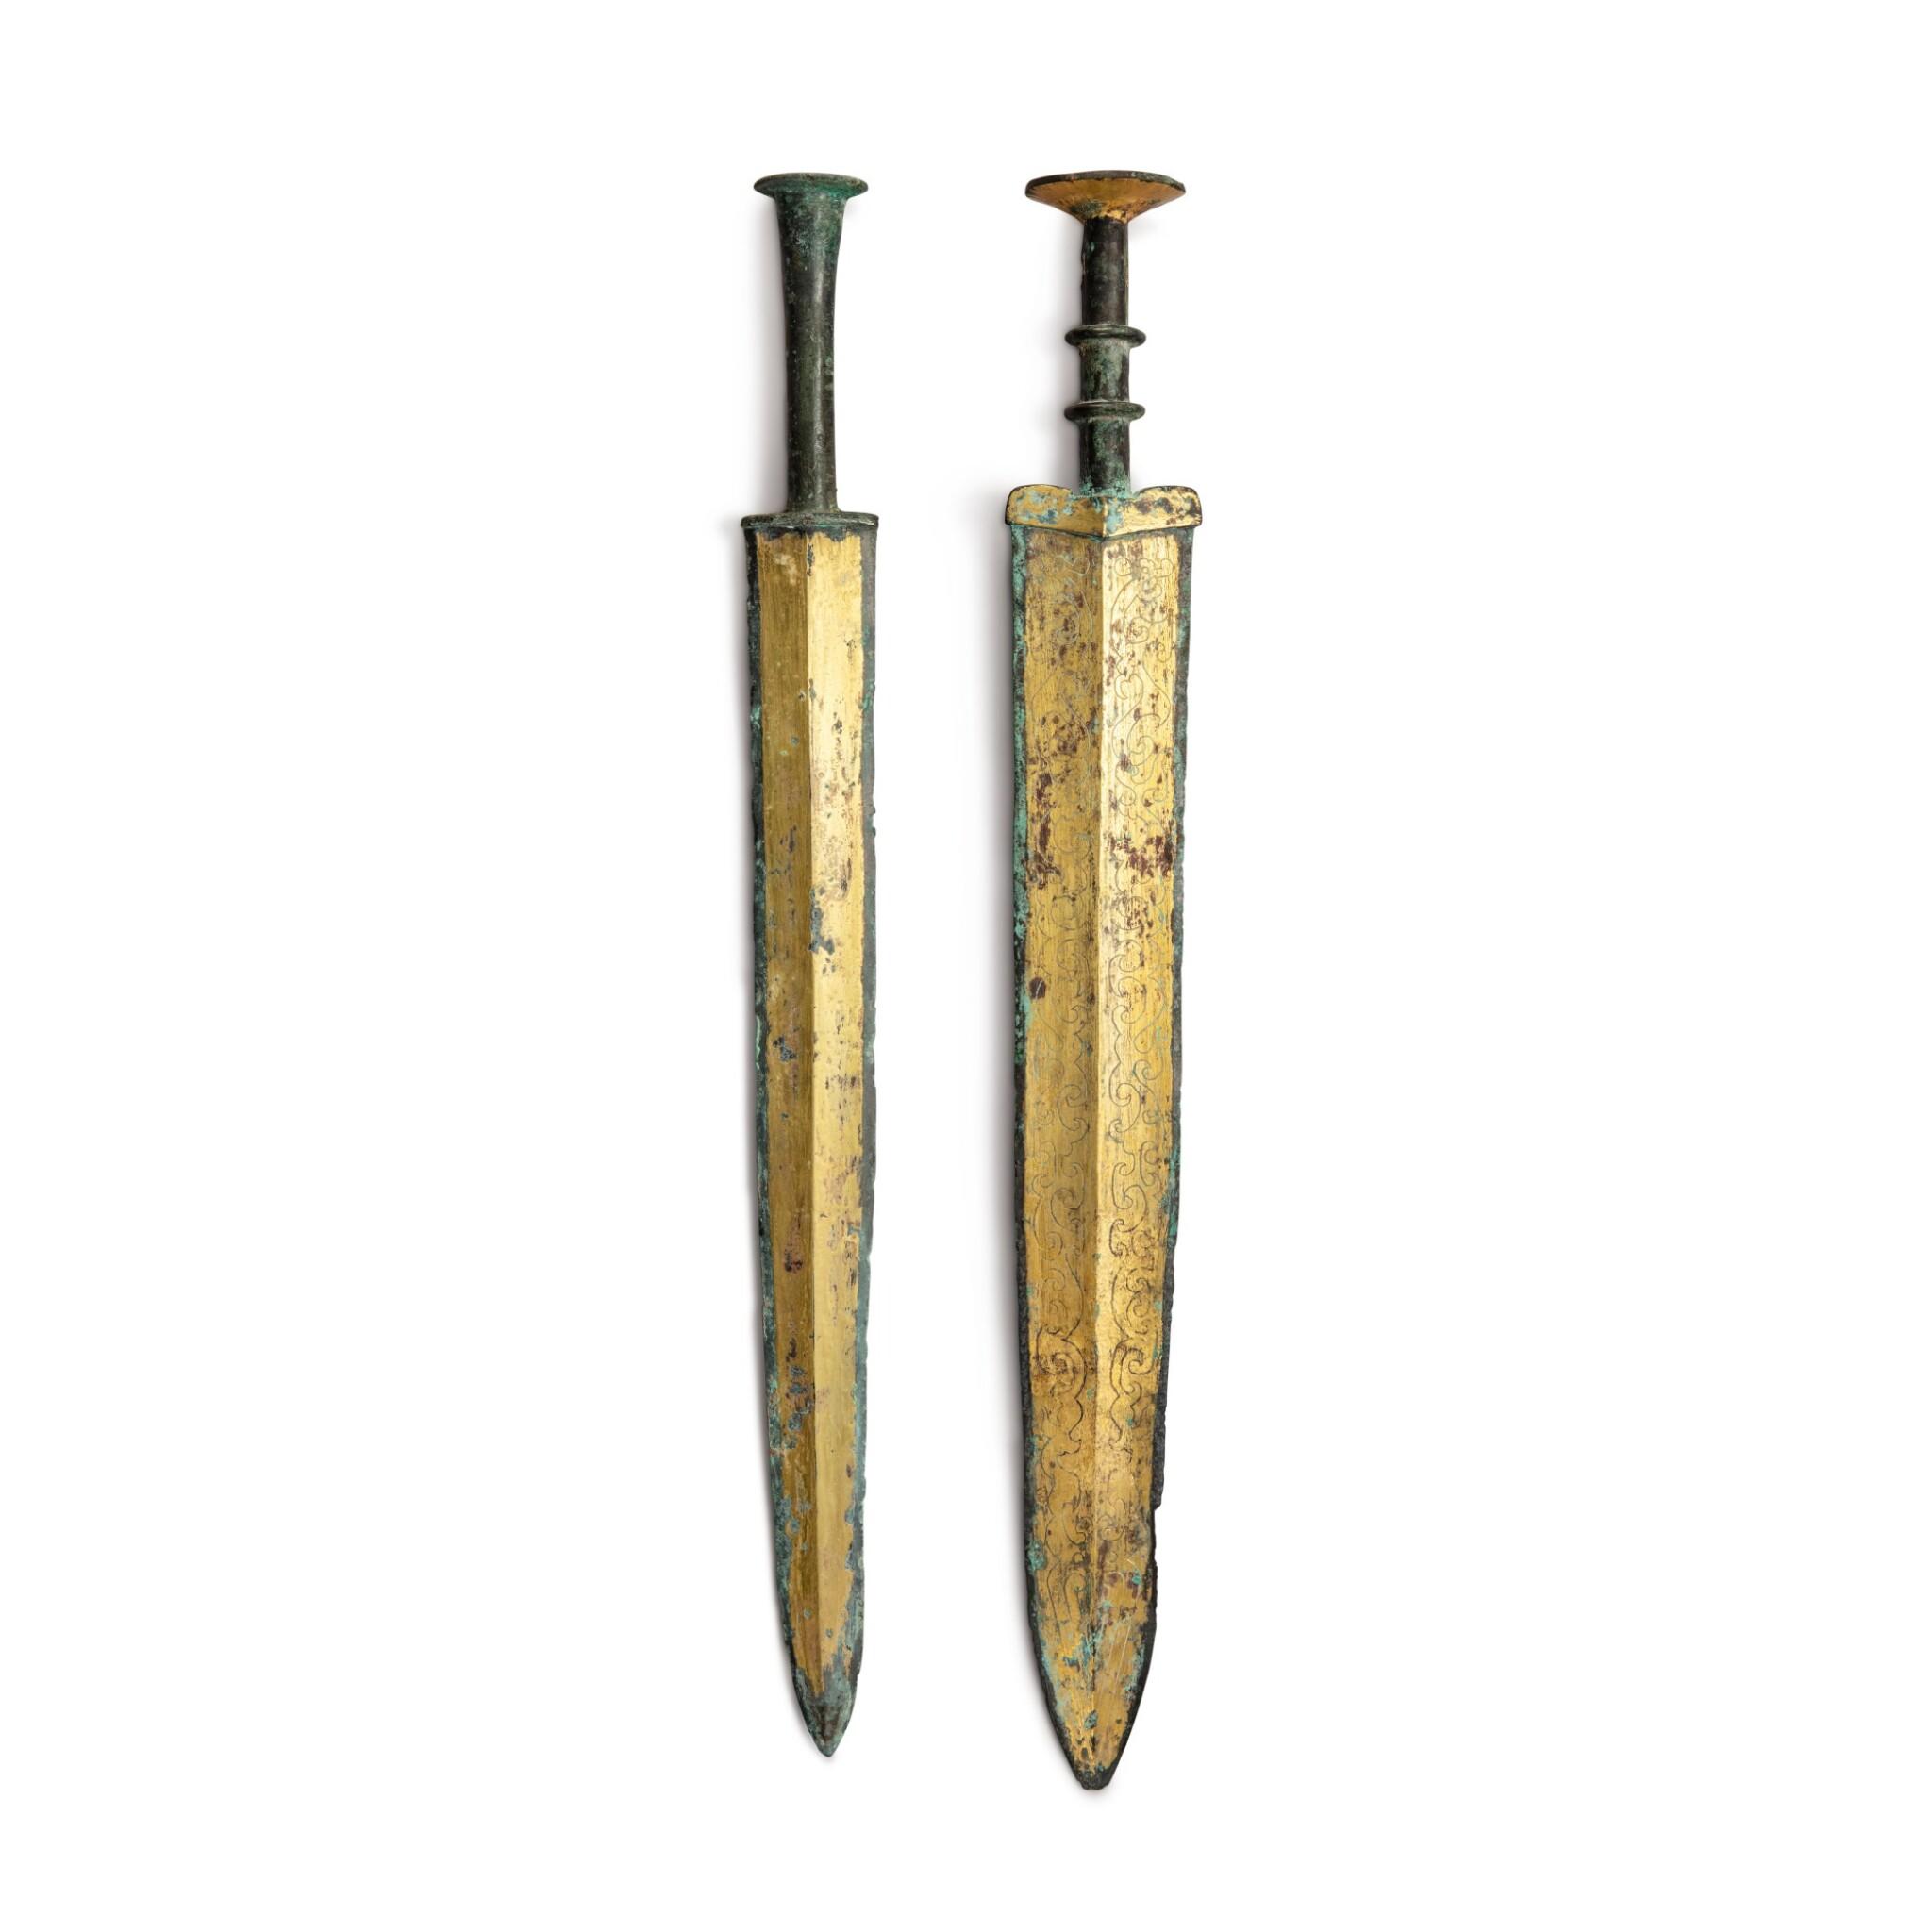 View full screen - View 1 of Lot 22. Two archaic gilt-bronze swords (Jian), Warring States period - Western Han dynasty | 戰國至西漢 銅鎏金龍紋劍及銅鎏金劍.